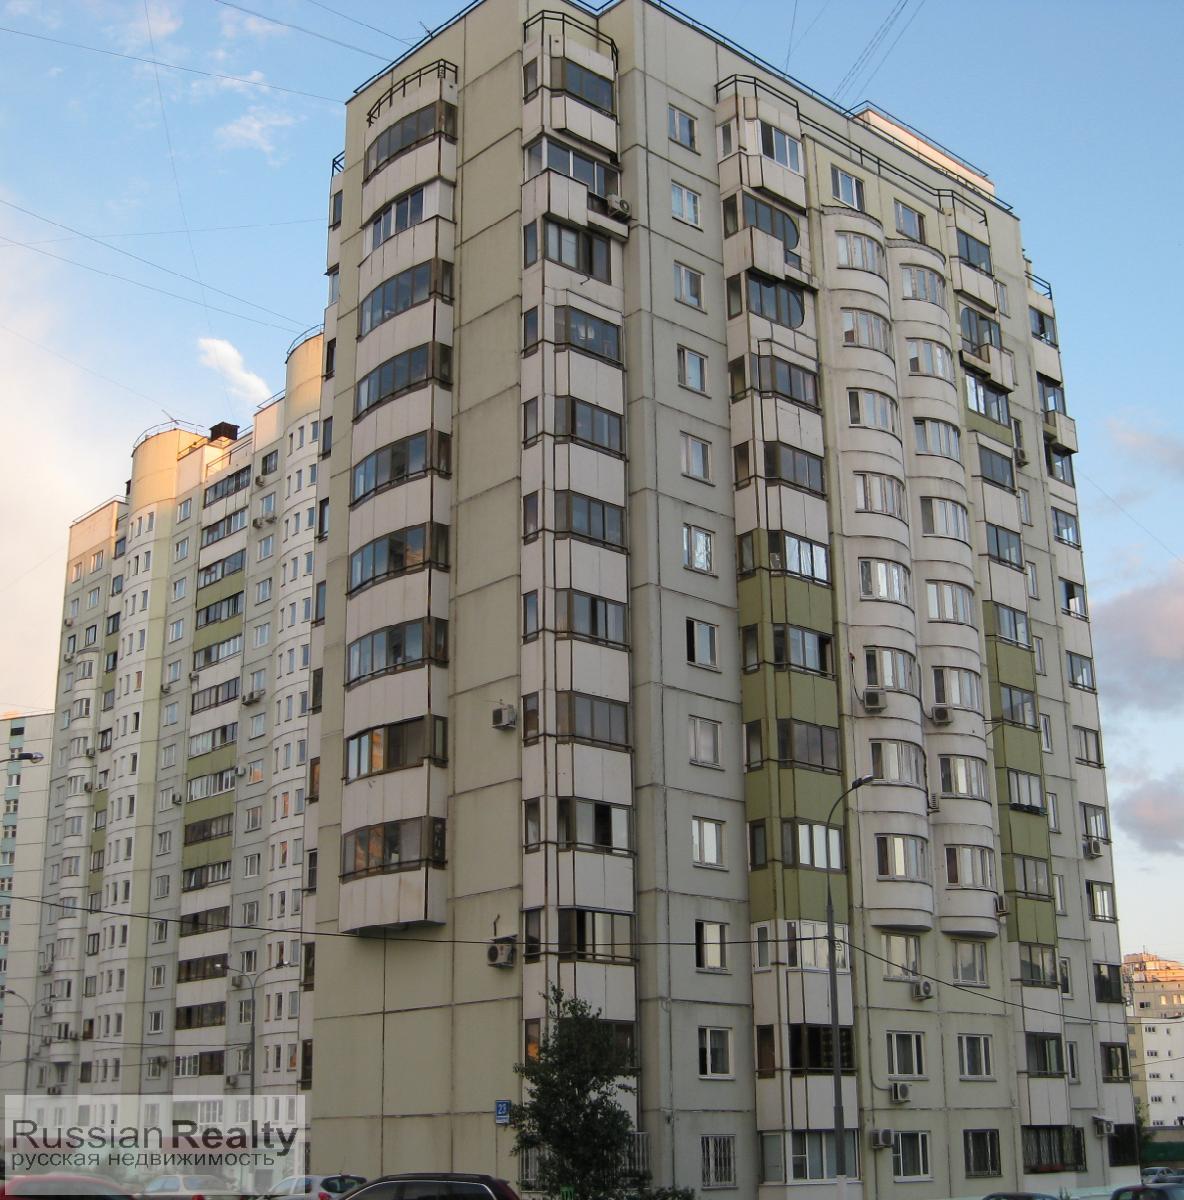 Серия дома и-155мк russianrealty.